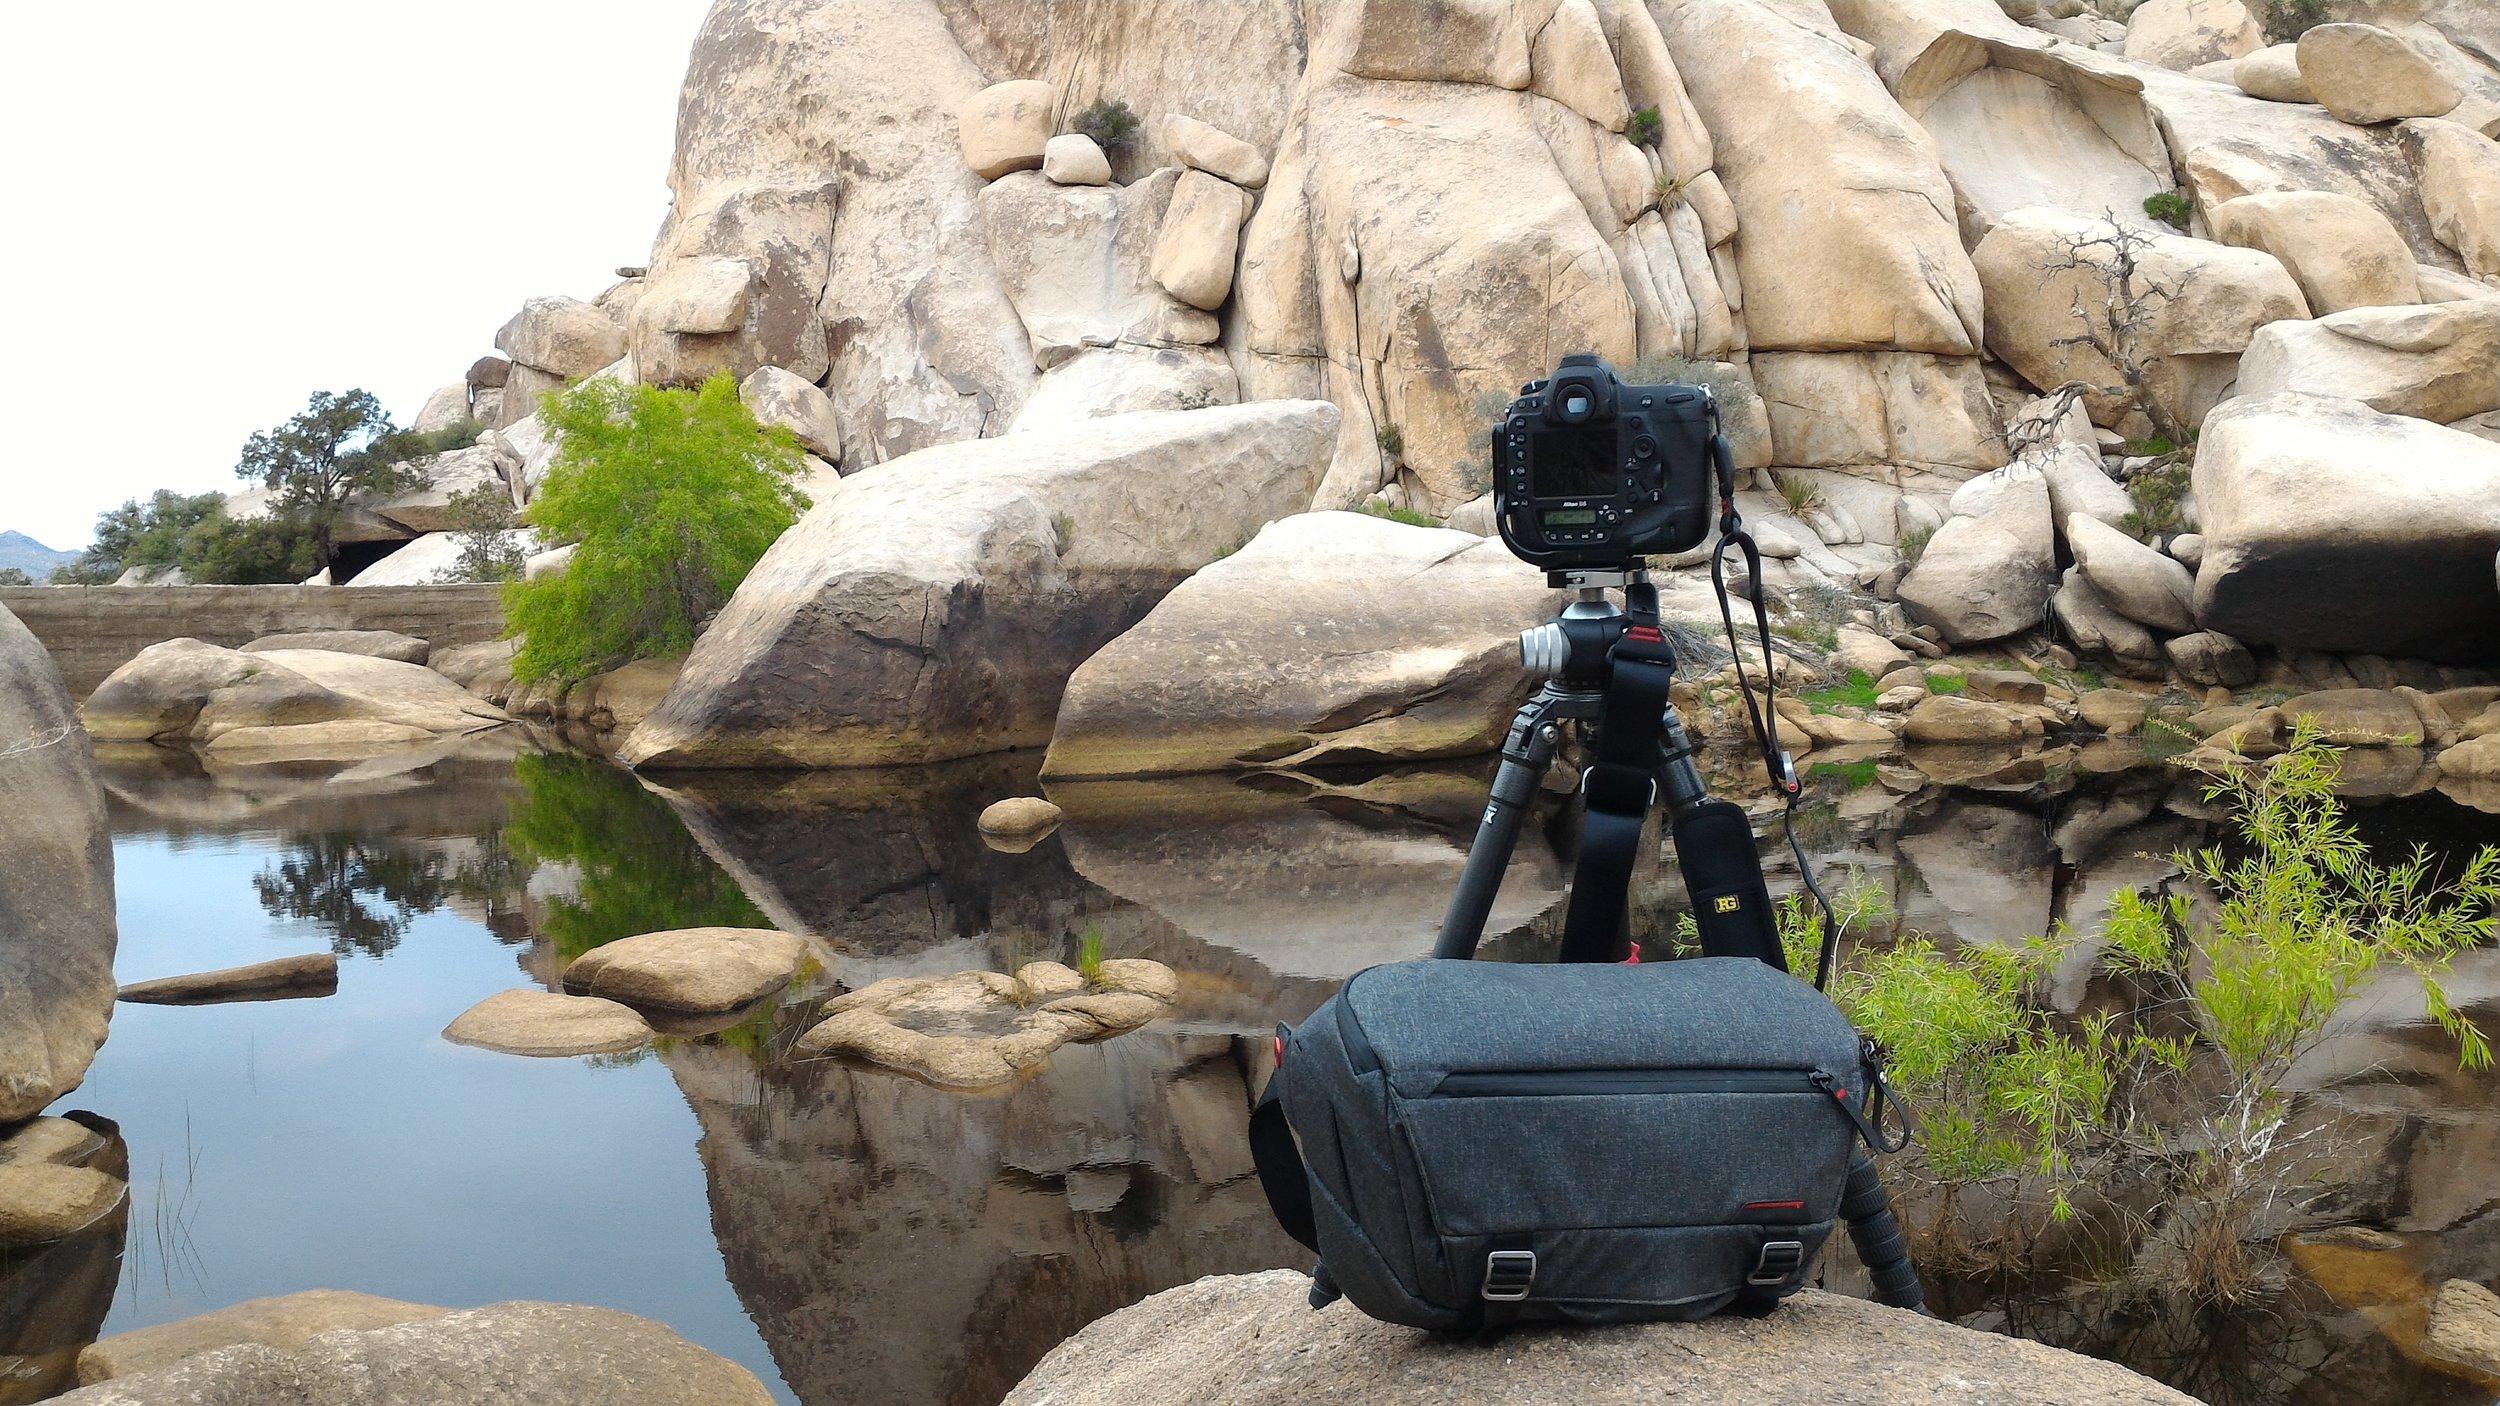 Gitzo 3541LS, Peak Design Everyday Messenger Bag, Joshua Tree National Park